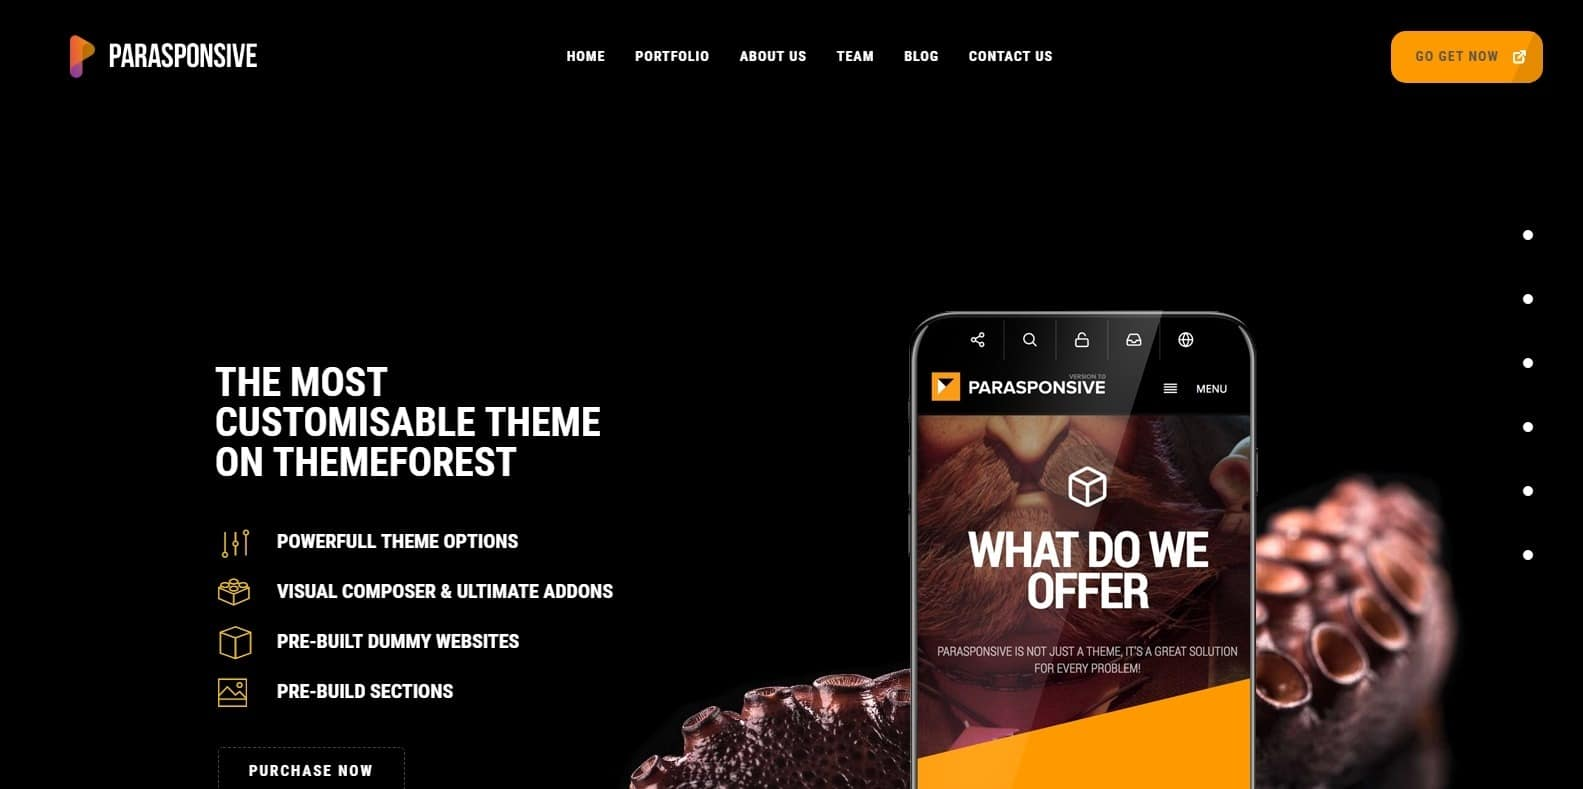 parasponsive-parallax-website-template